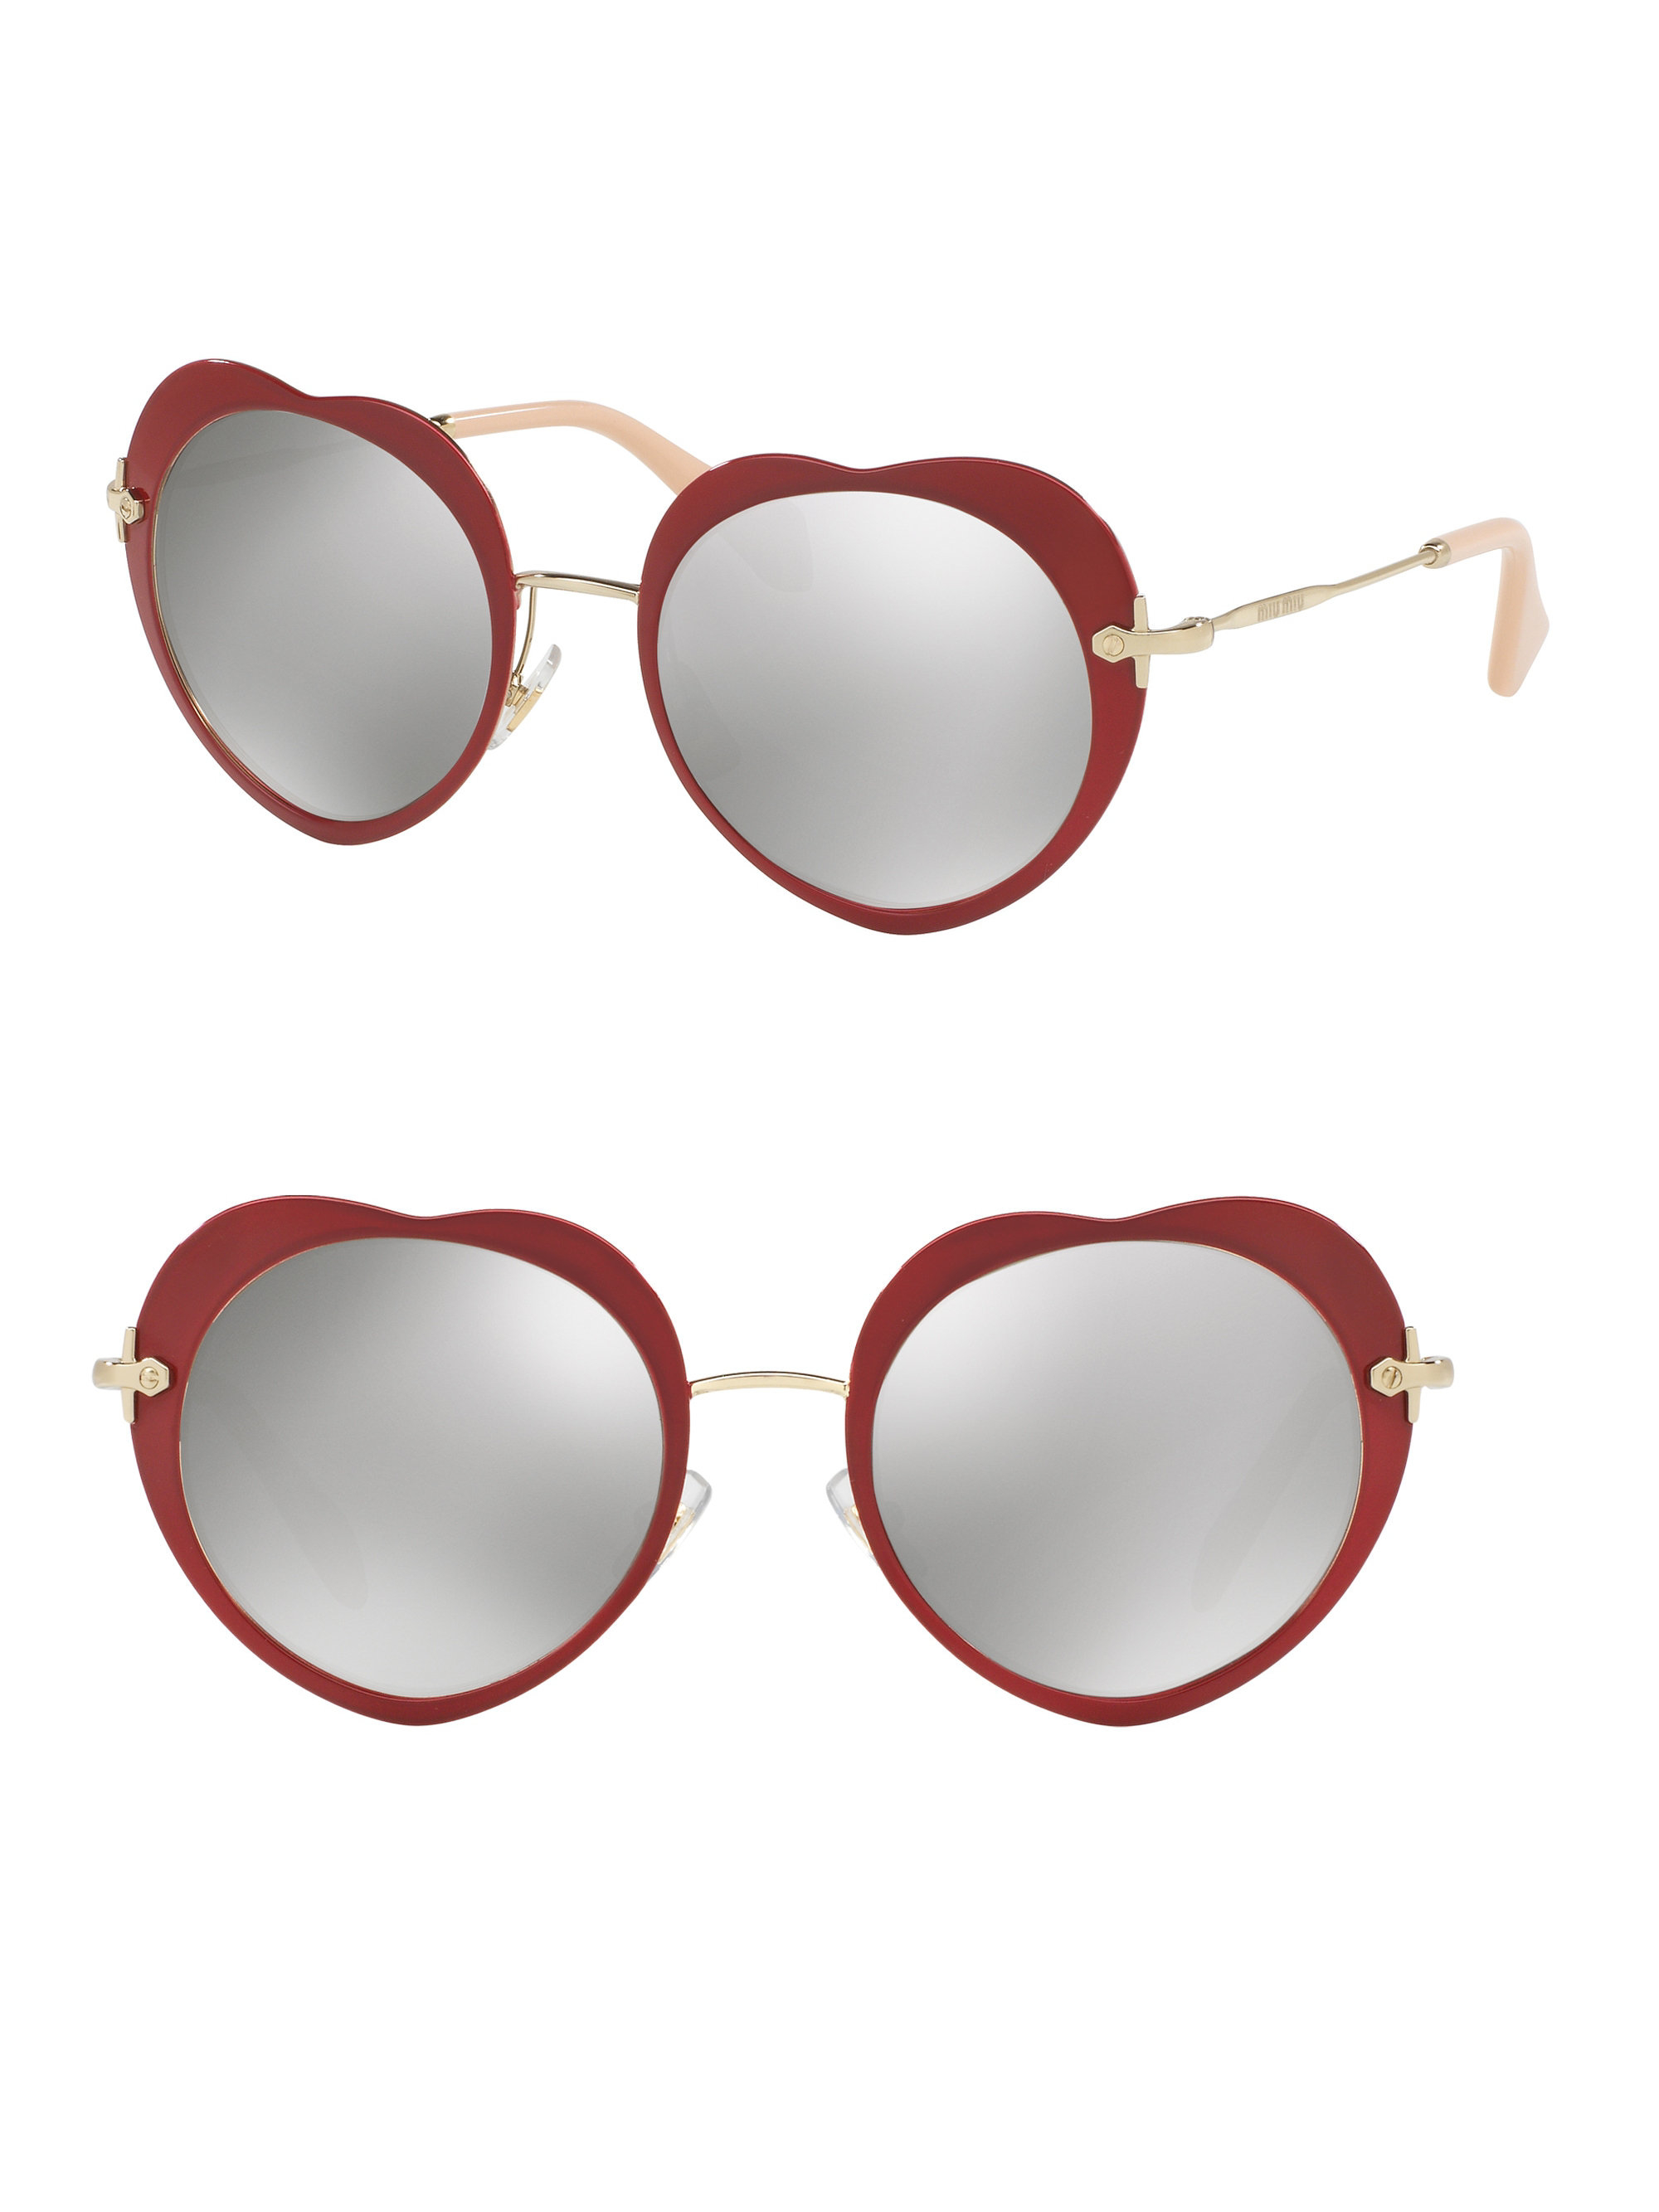 445d3acedcc9 Miu Miu Sunglasses Sale Ebay